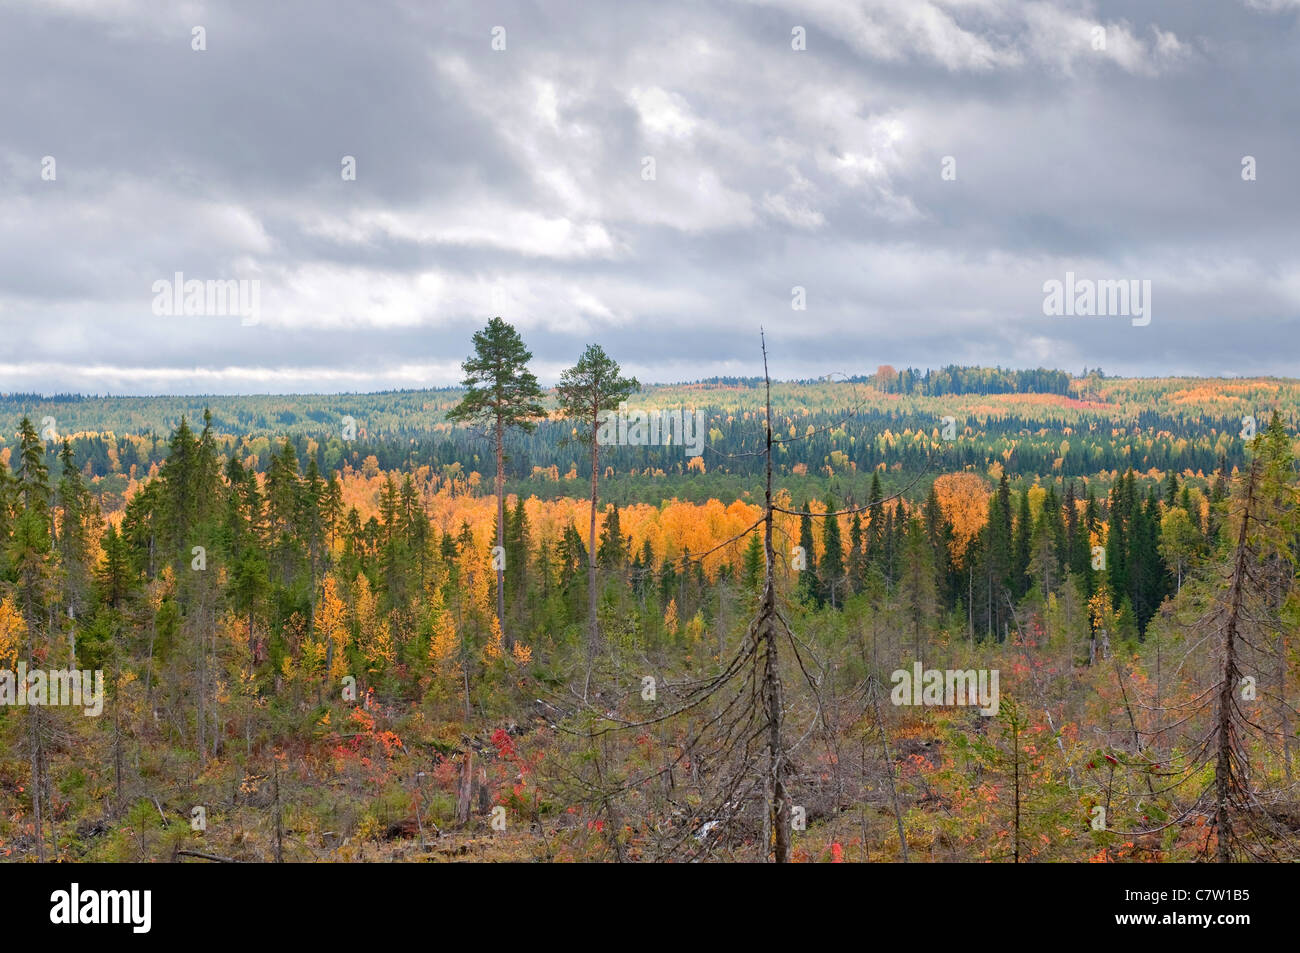 Taiga (boreal forest) in Komi region, northern Russia. - Stock Image